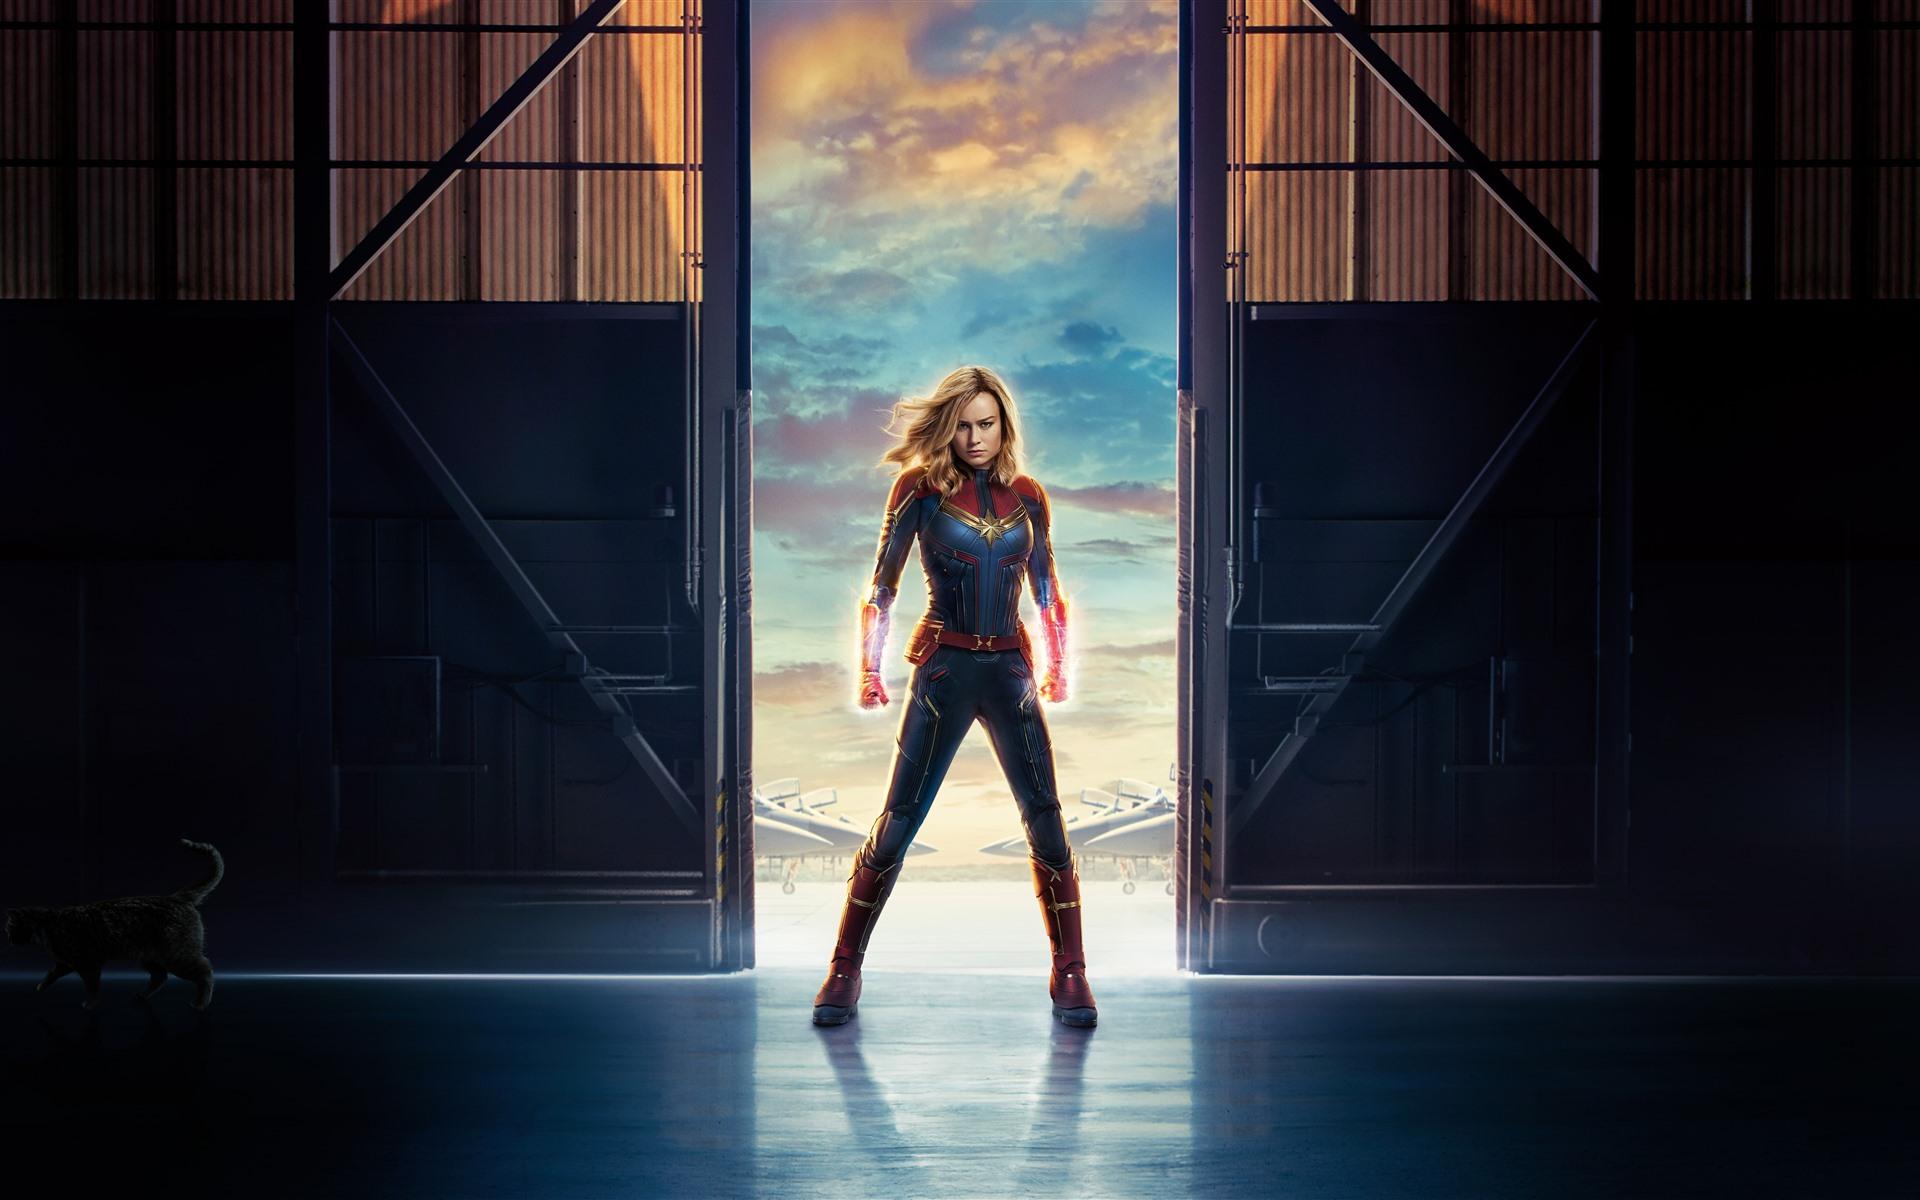 Captain Marvel, Brie Larson, Marvel movie 2019 1242x2688 ...